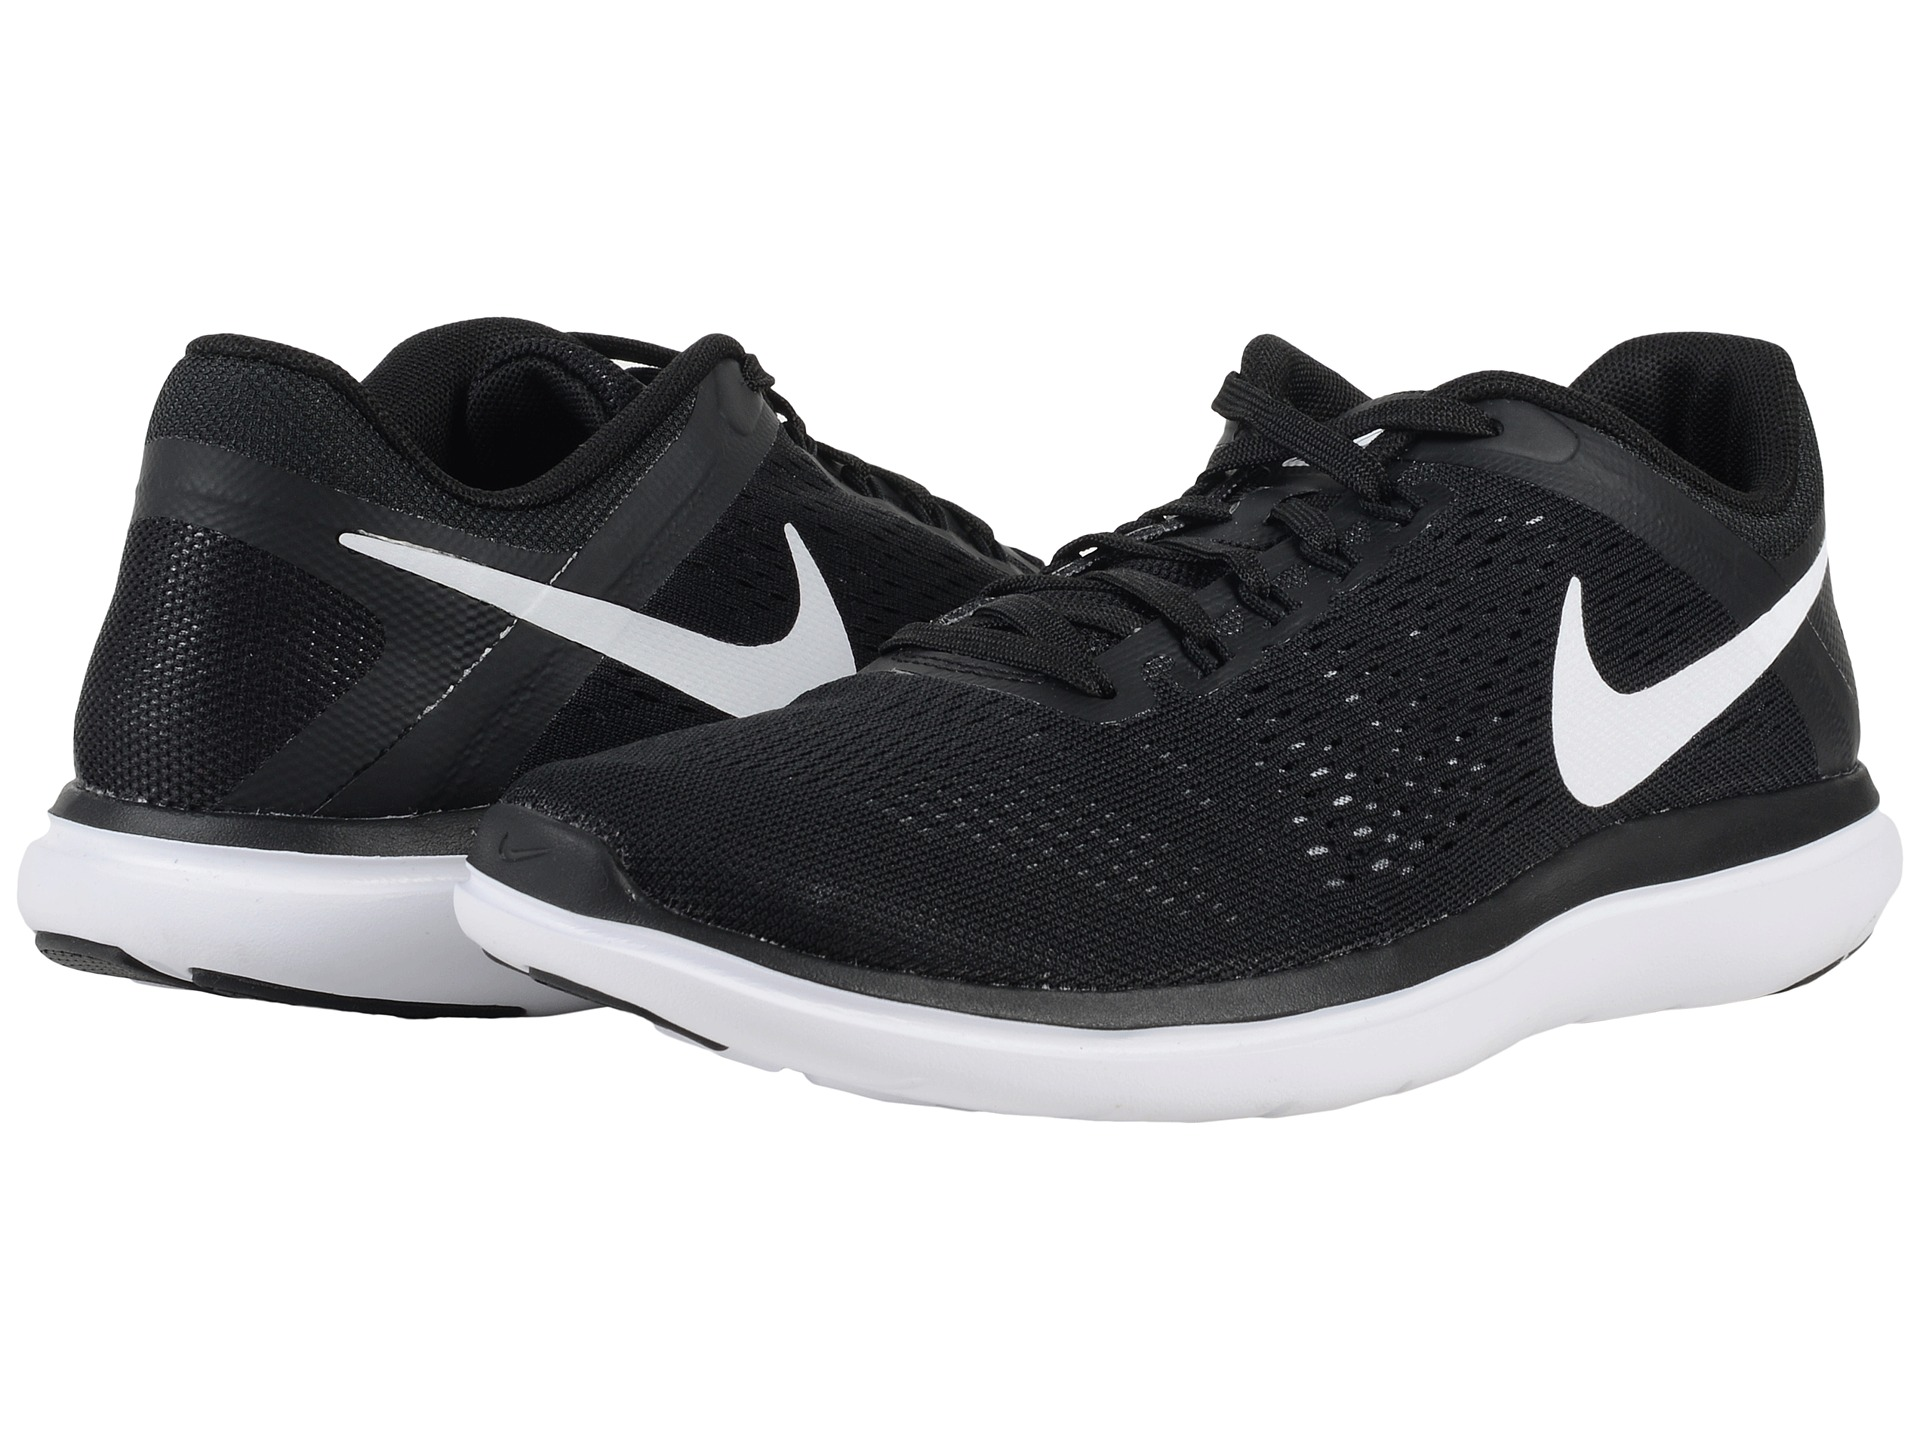 Nike Flex 2016 RN - Zappos.com Free Shipping BOTH Ways